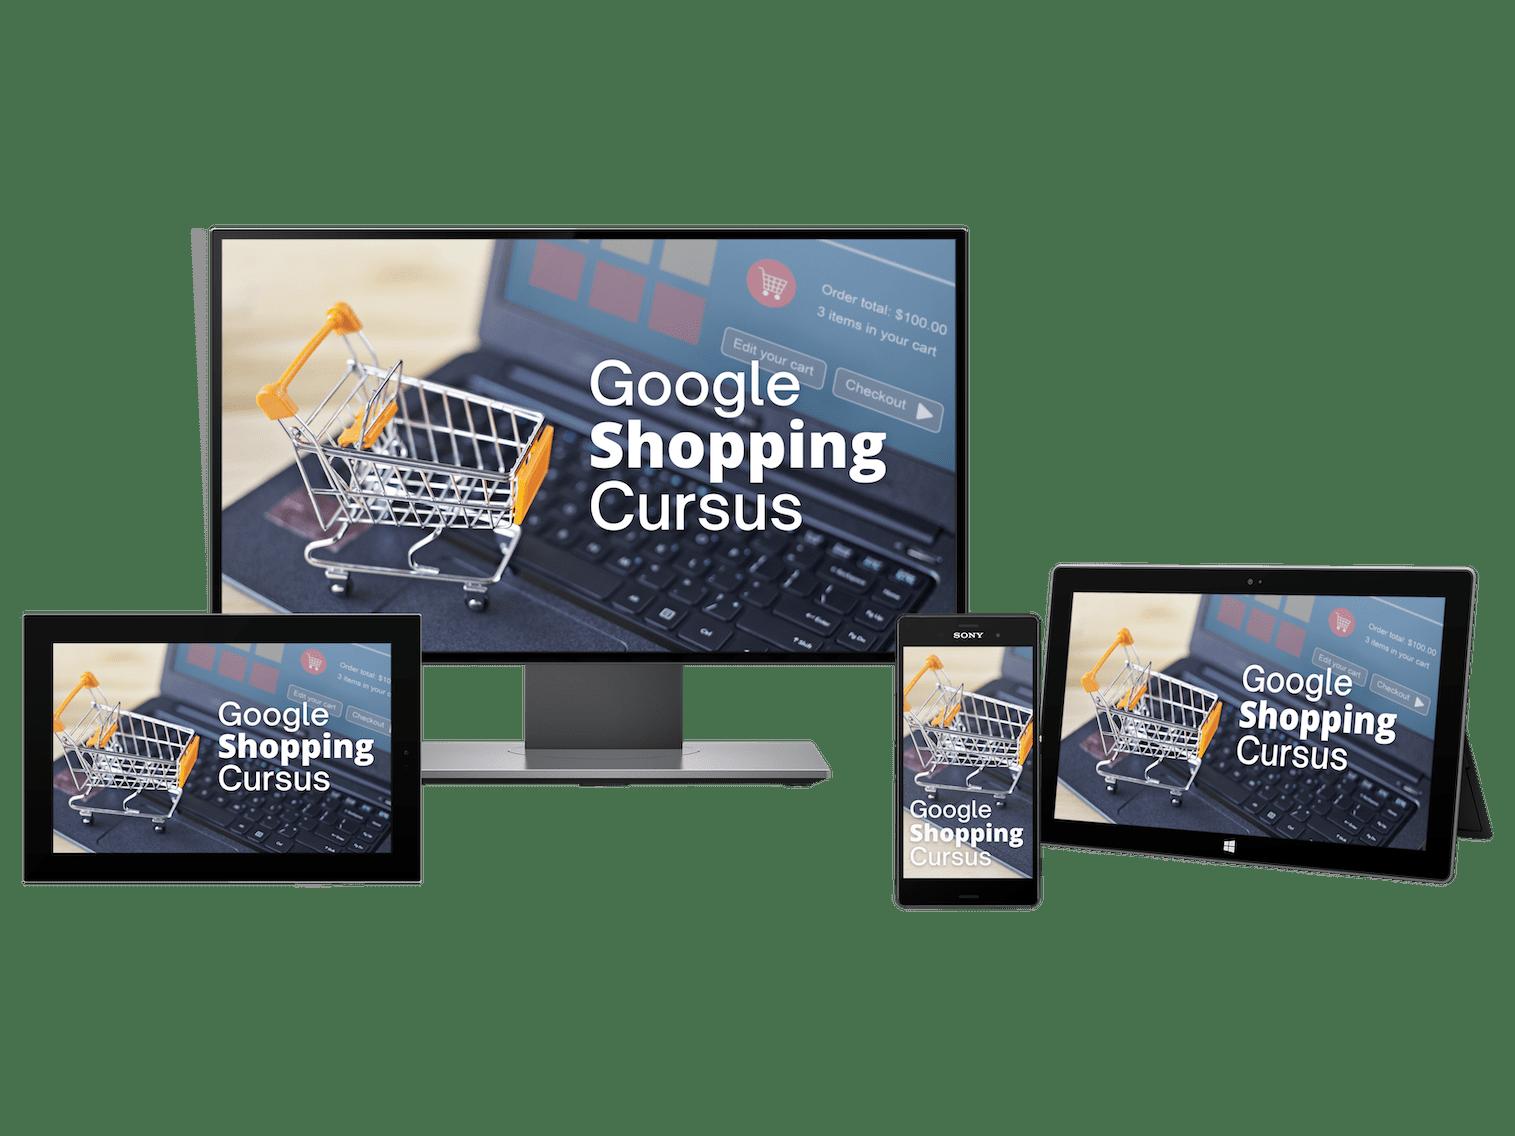 Google Shopping Cursus